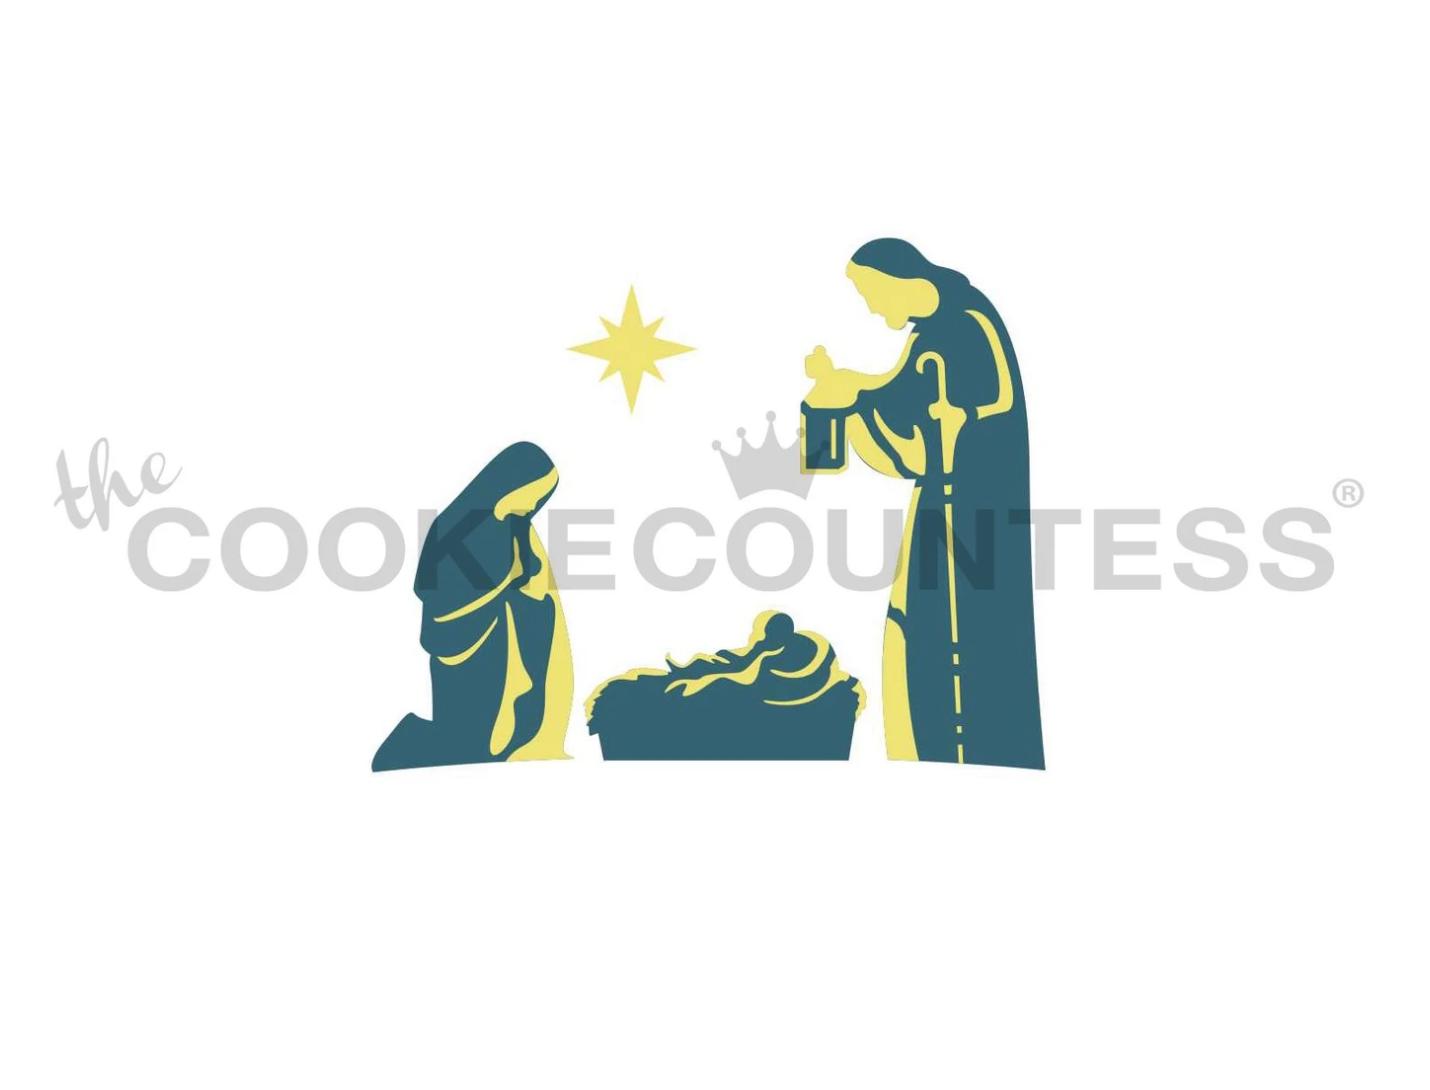 Nativity Scene Stencil by Cookie Countess - 2 Piece